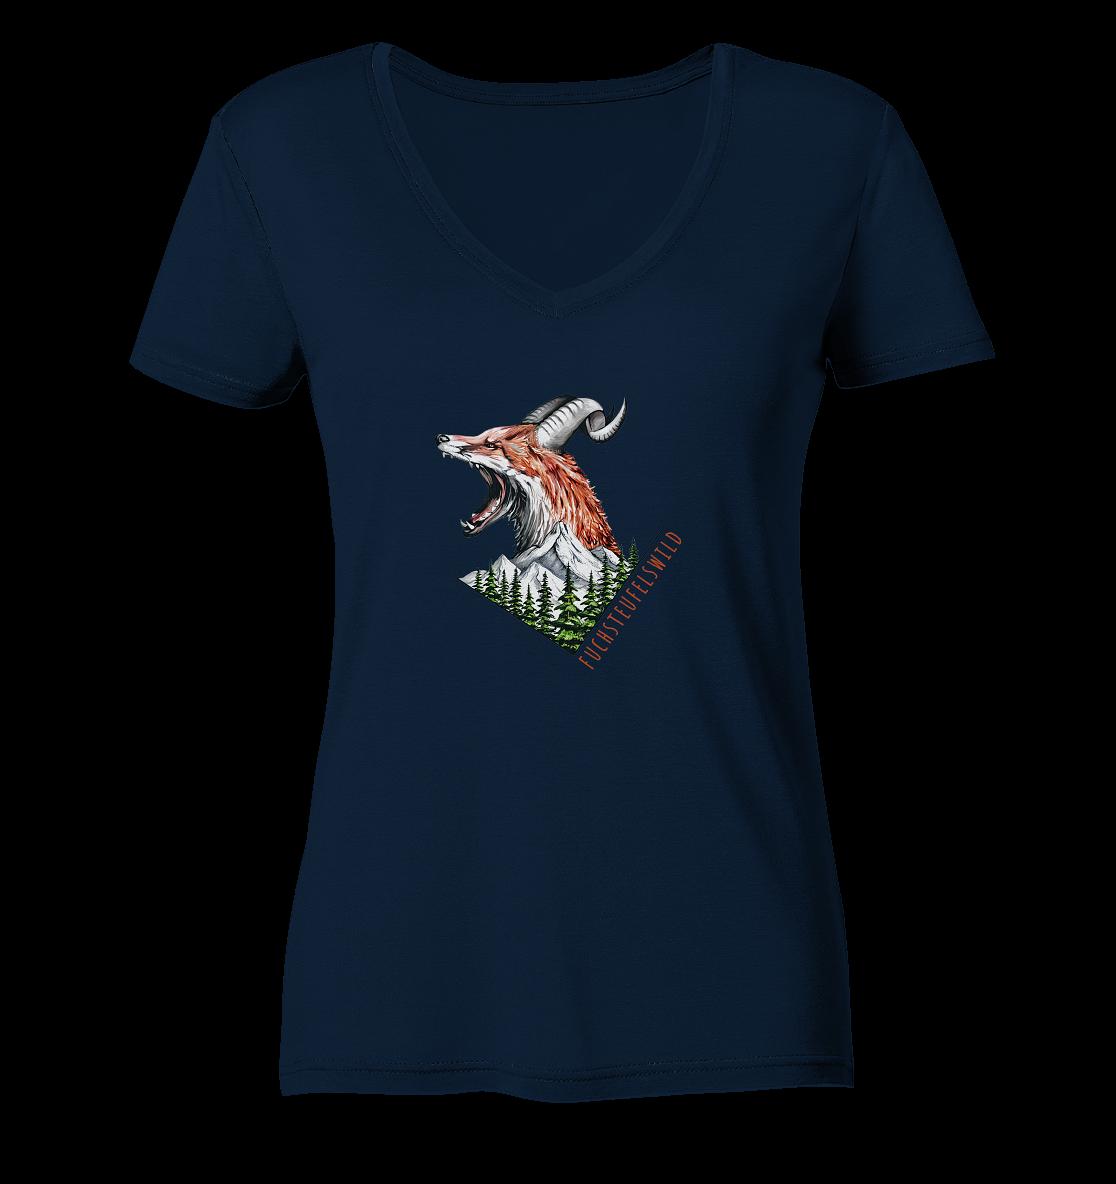 front-ladies-organic-v-neck-shirt-0e2035-1116x.png